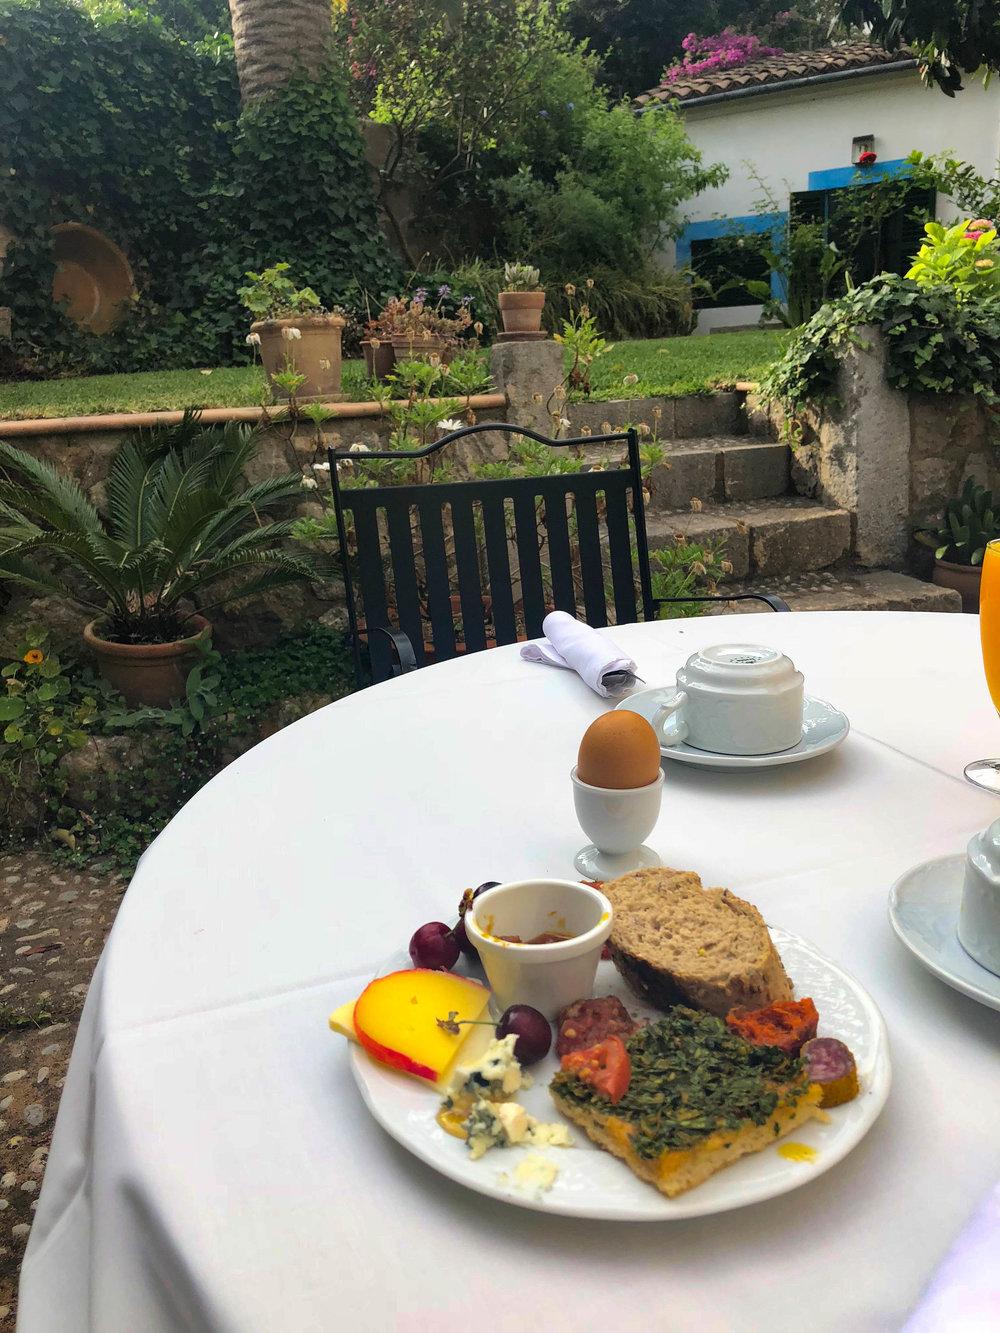 Breakfast in our hotel garden